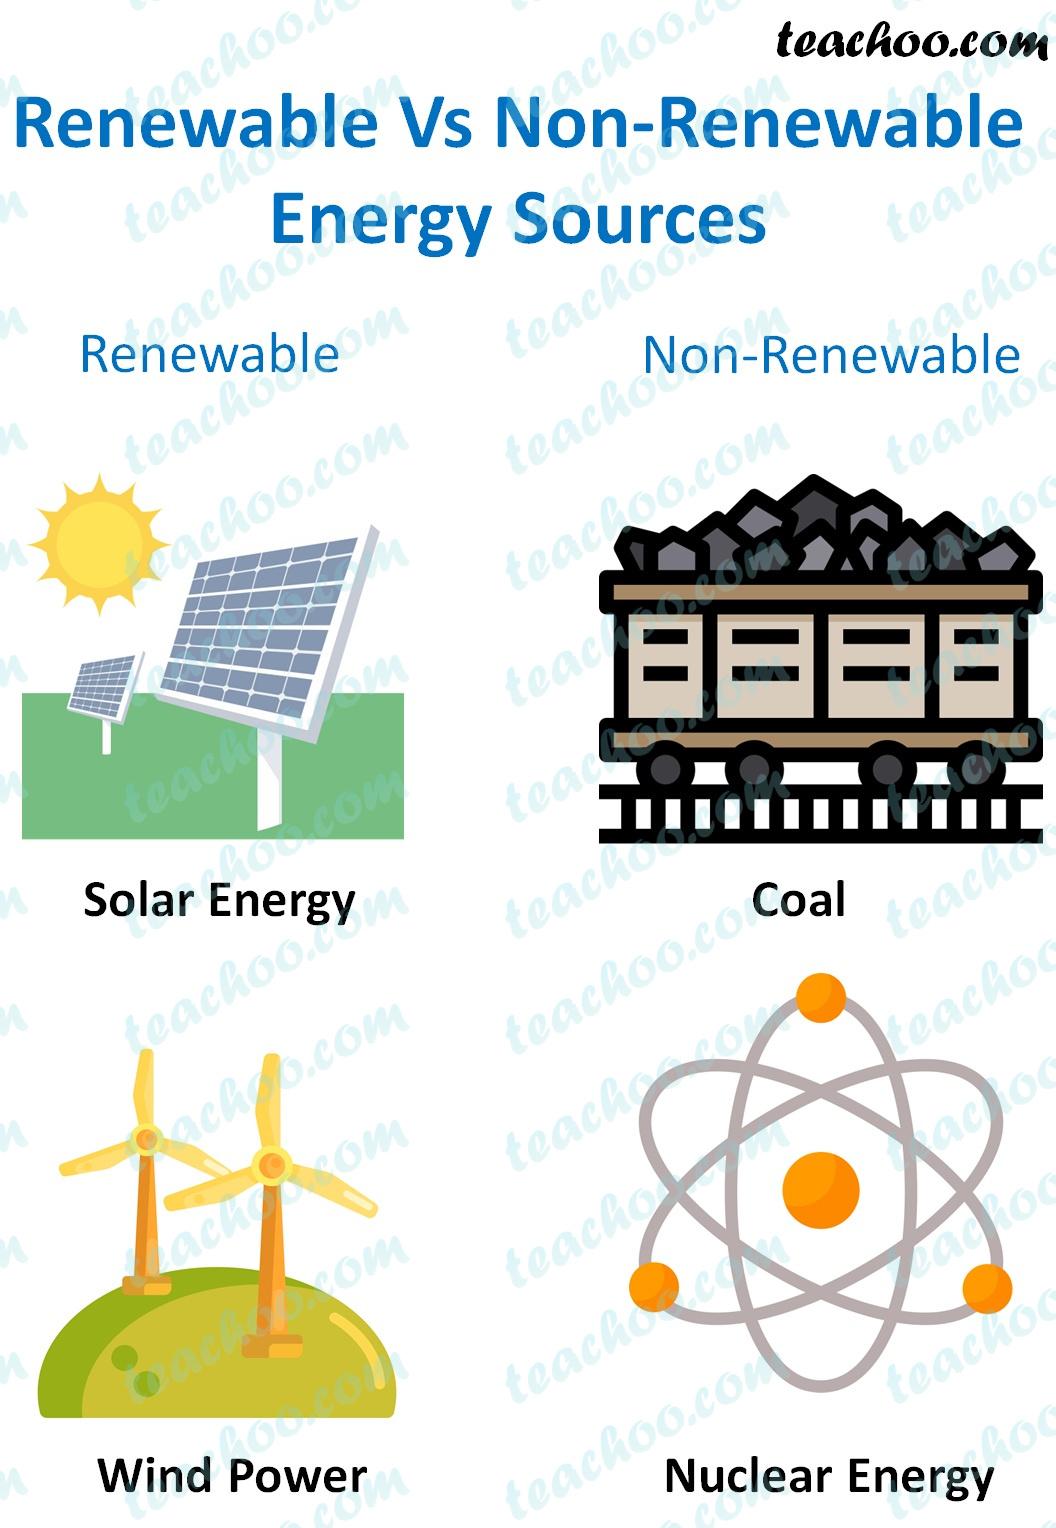 renewable-vs-non-renewable-energy-sources---teachoo.jpg